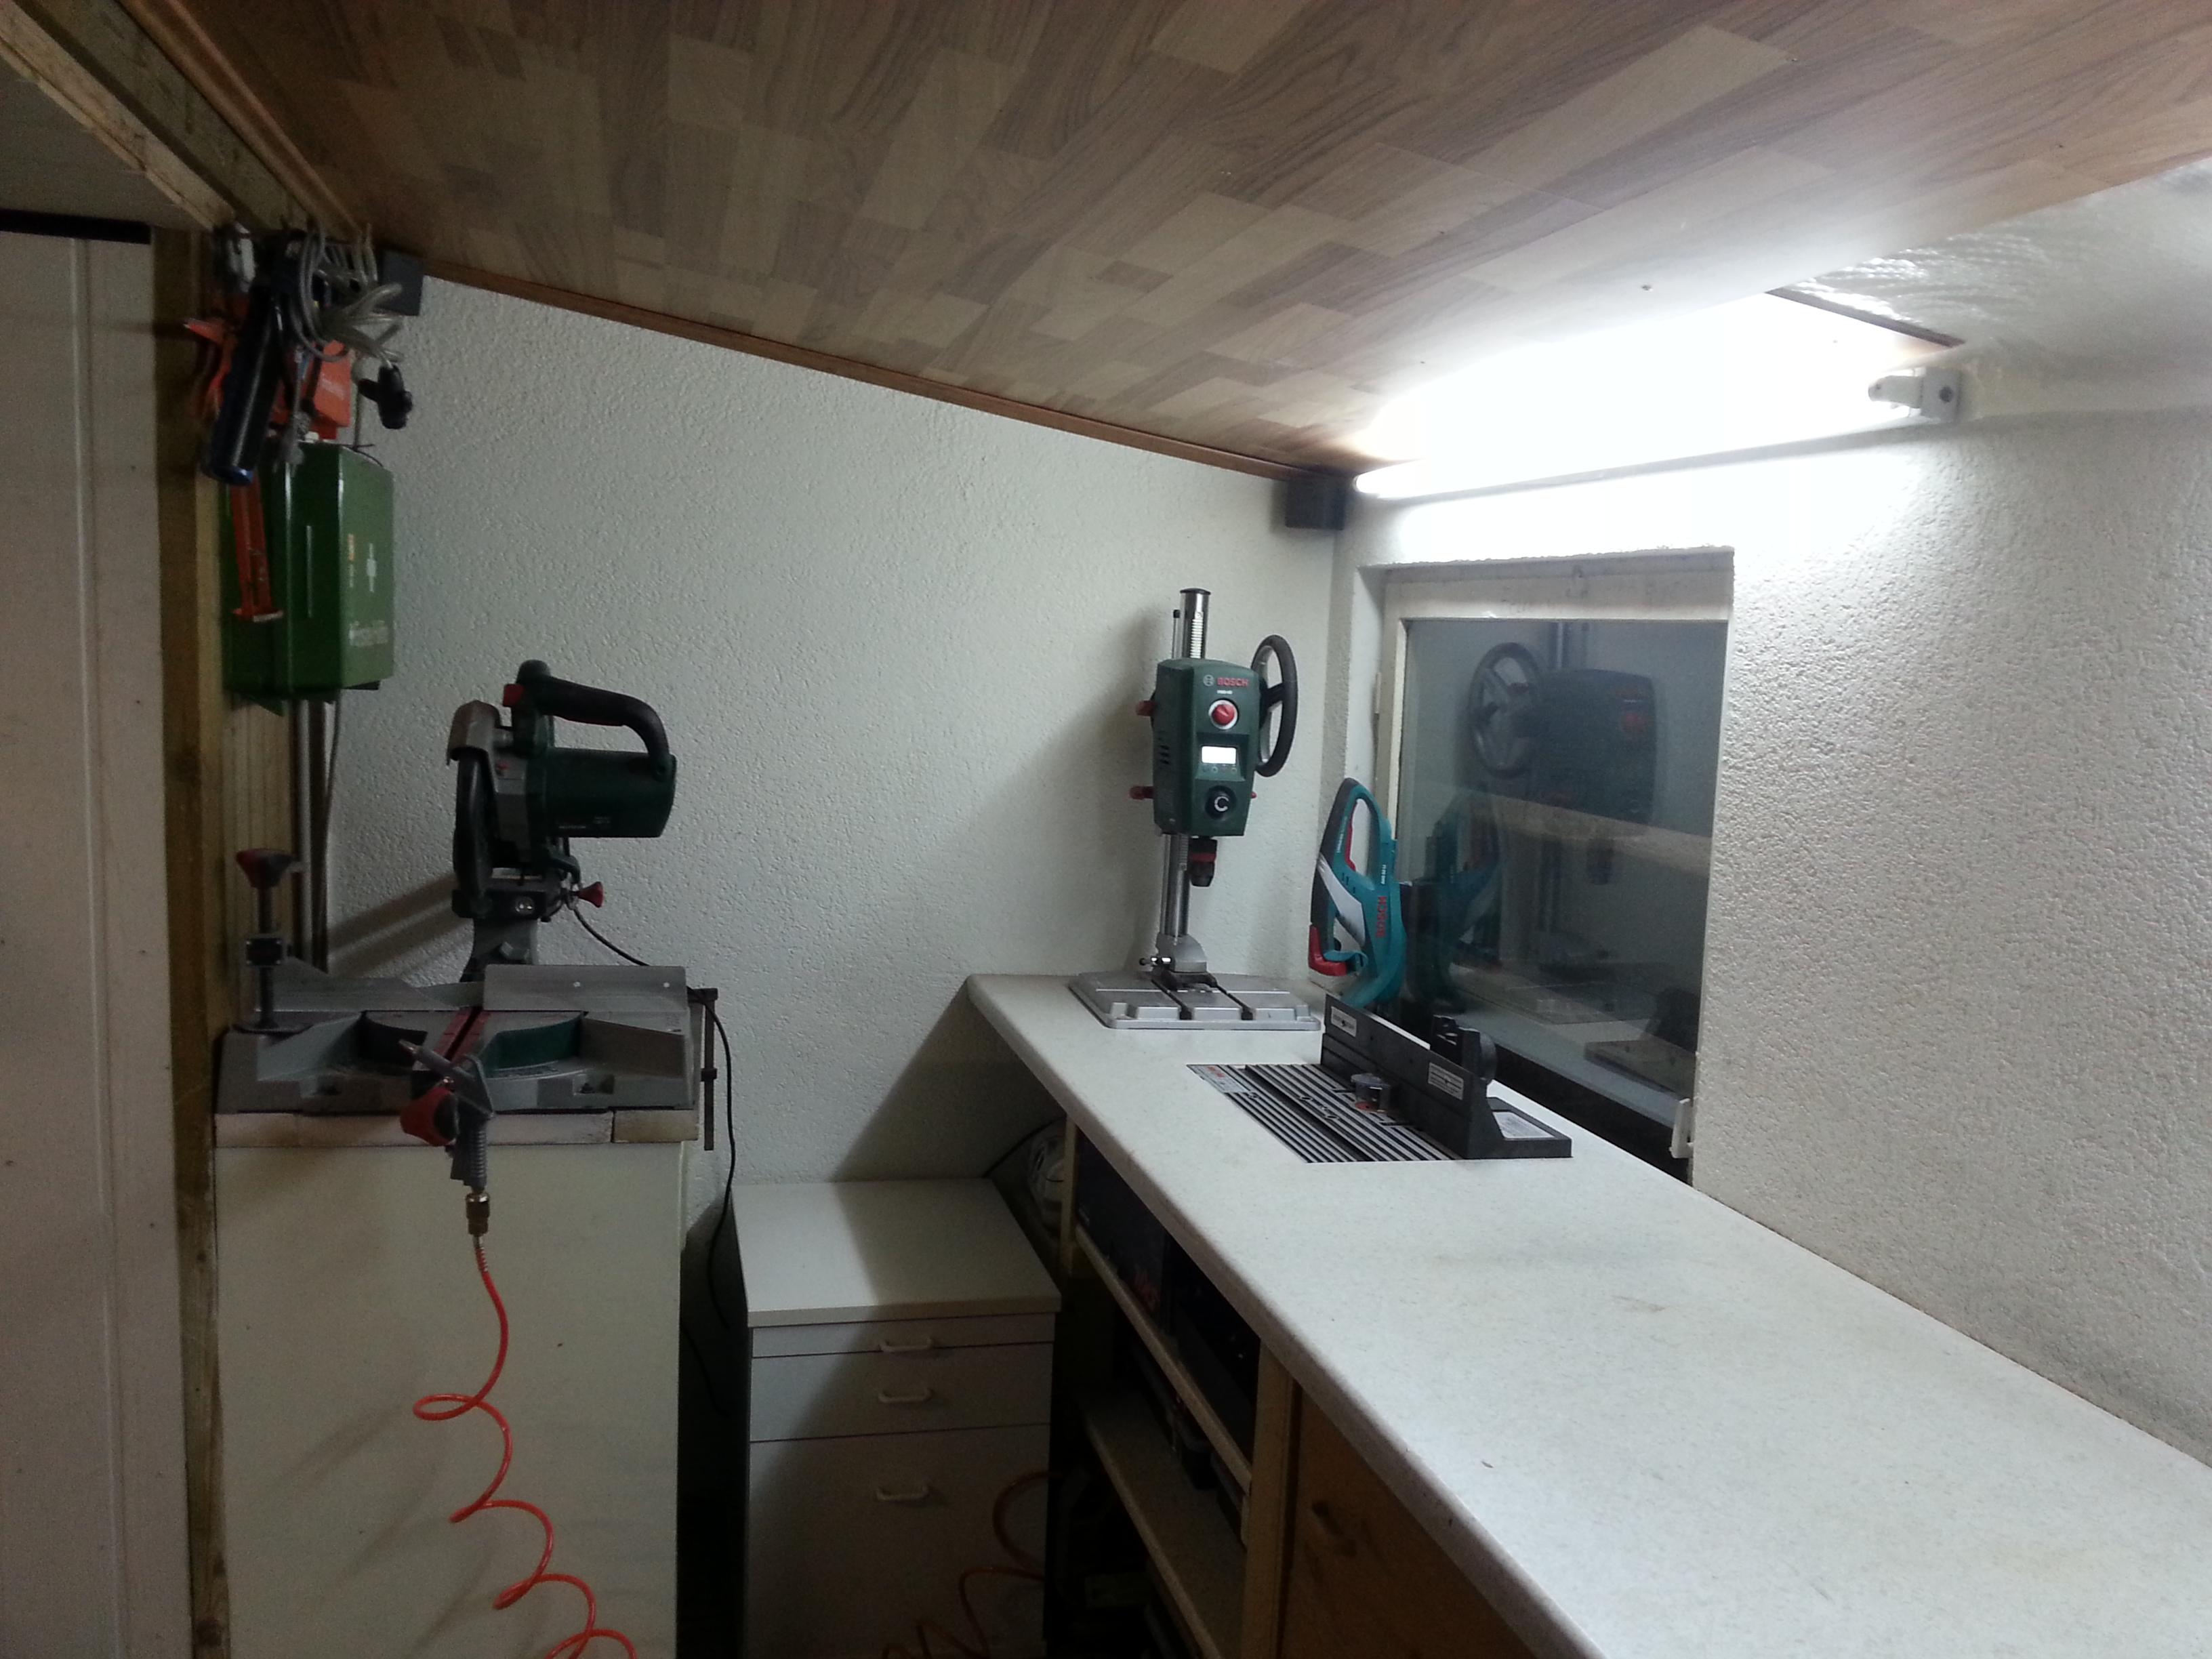 selbst gebaute Werkstatt